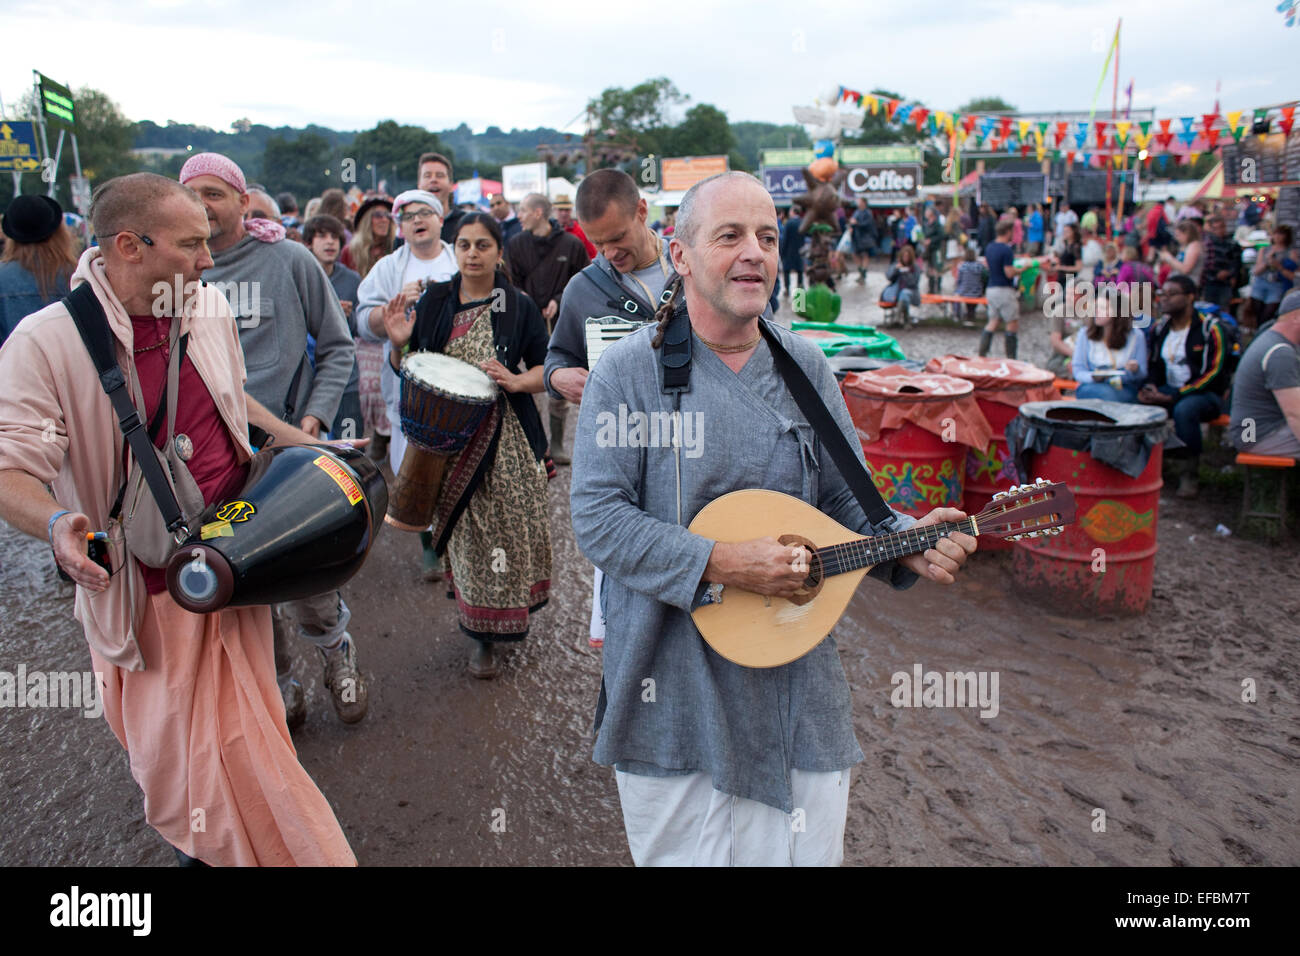 28. Juni 2014. Hare Krishnas Wandern Sie durch das Festival am Samstag Nachmittag. Stockbild